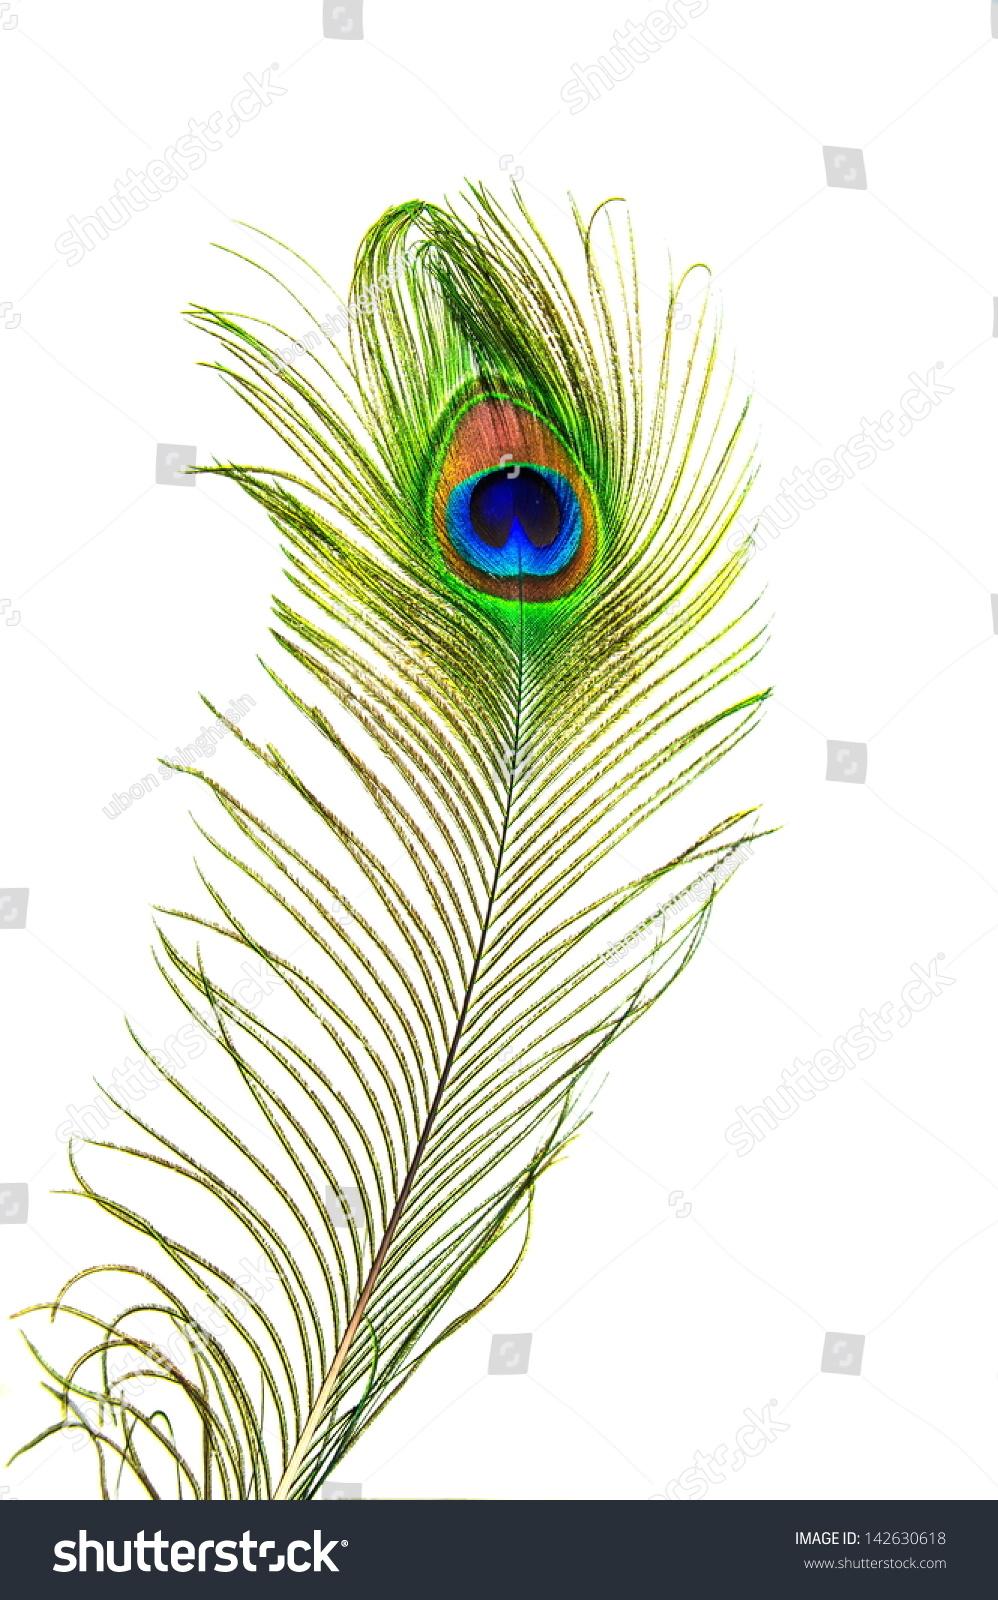 Beautiful peacock feathers stock photo 142630618 shutterstock - Beautiful peacock feather ...